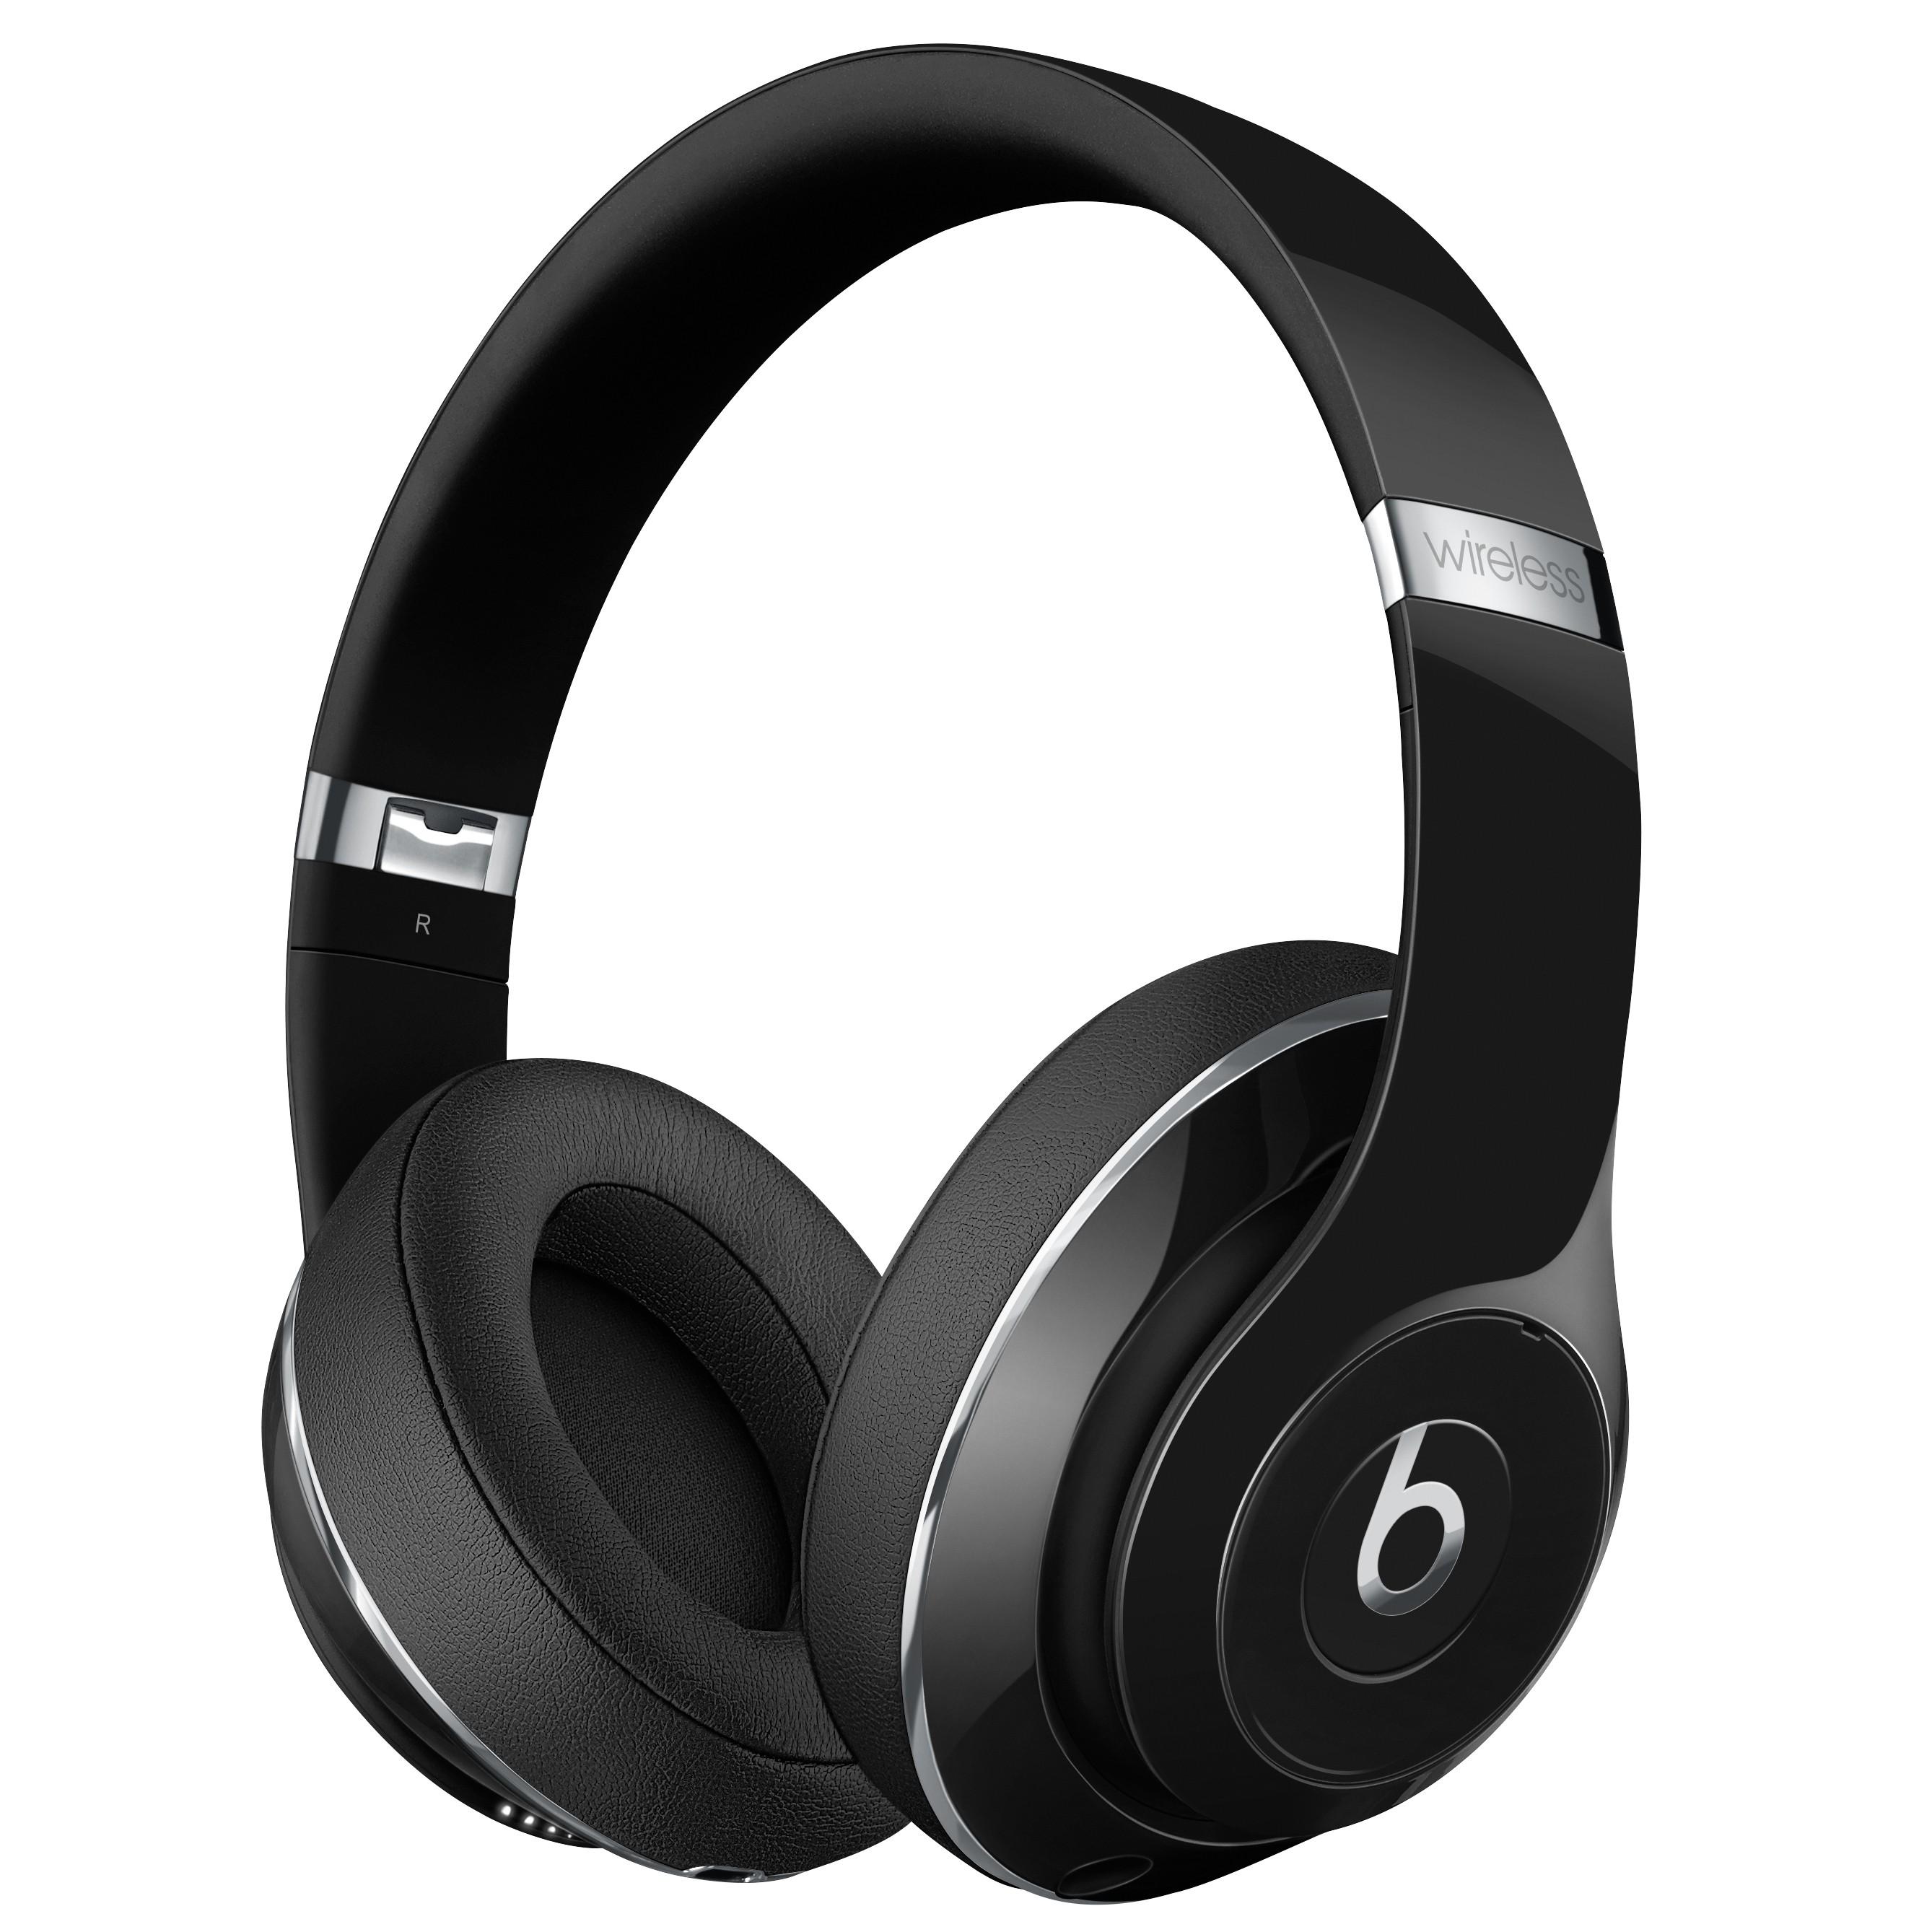 Beats Studio trådløse around-ear hodetelefoner (sort) STUDIOWIRGBK